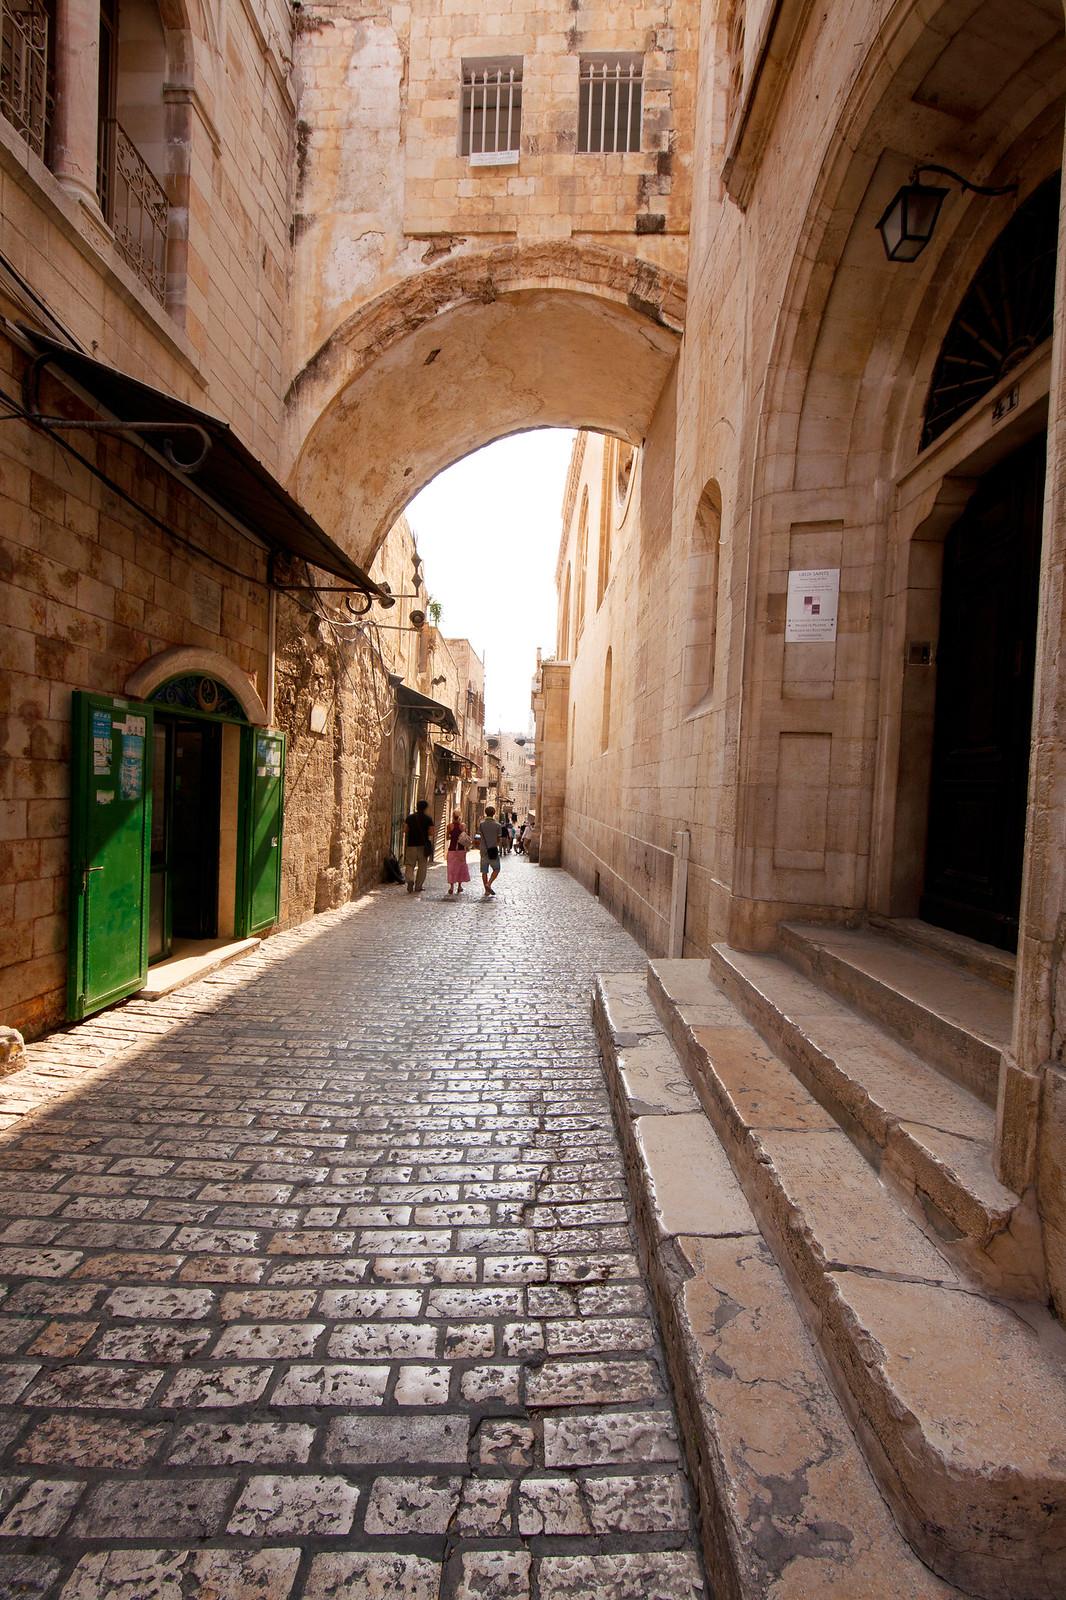 Jerusalem_Via Dolorosa_Ecce Homo Arch_Noam Chen_IMOT